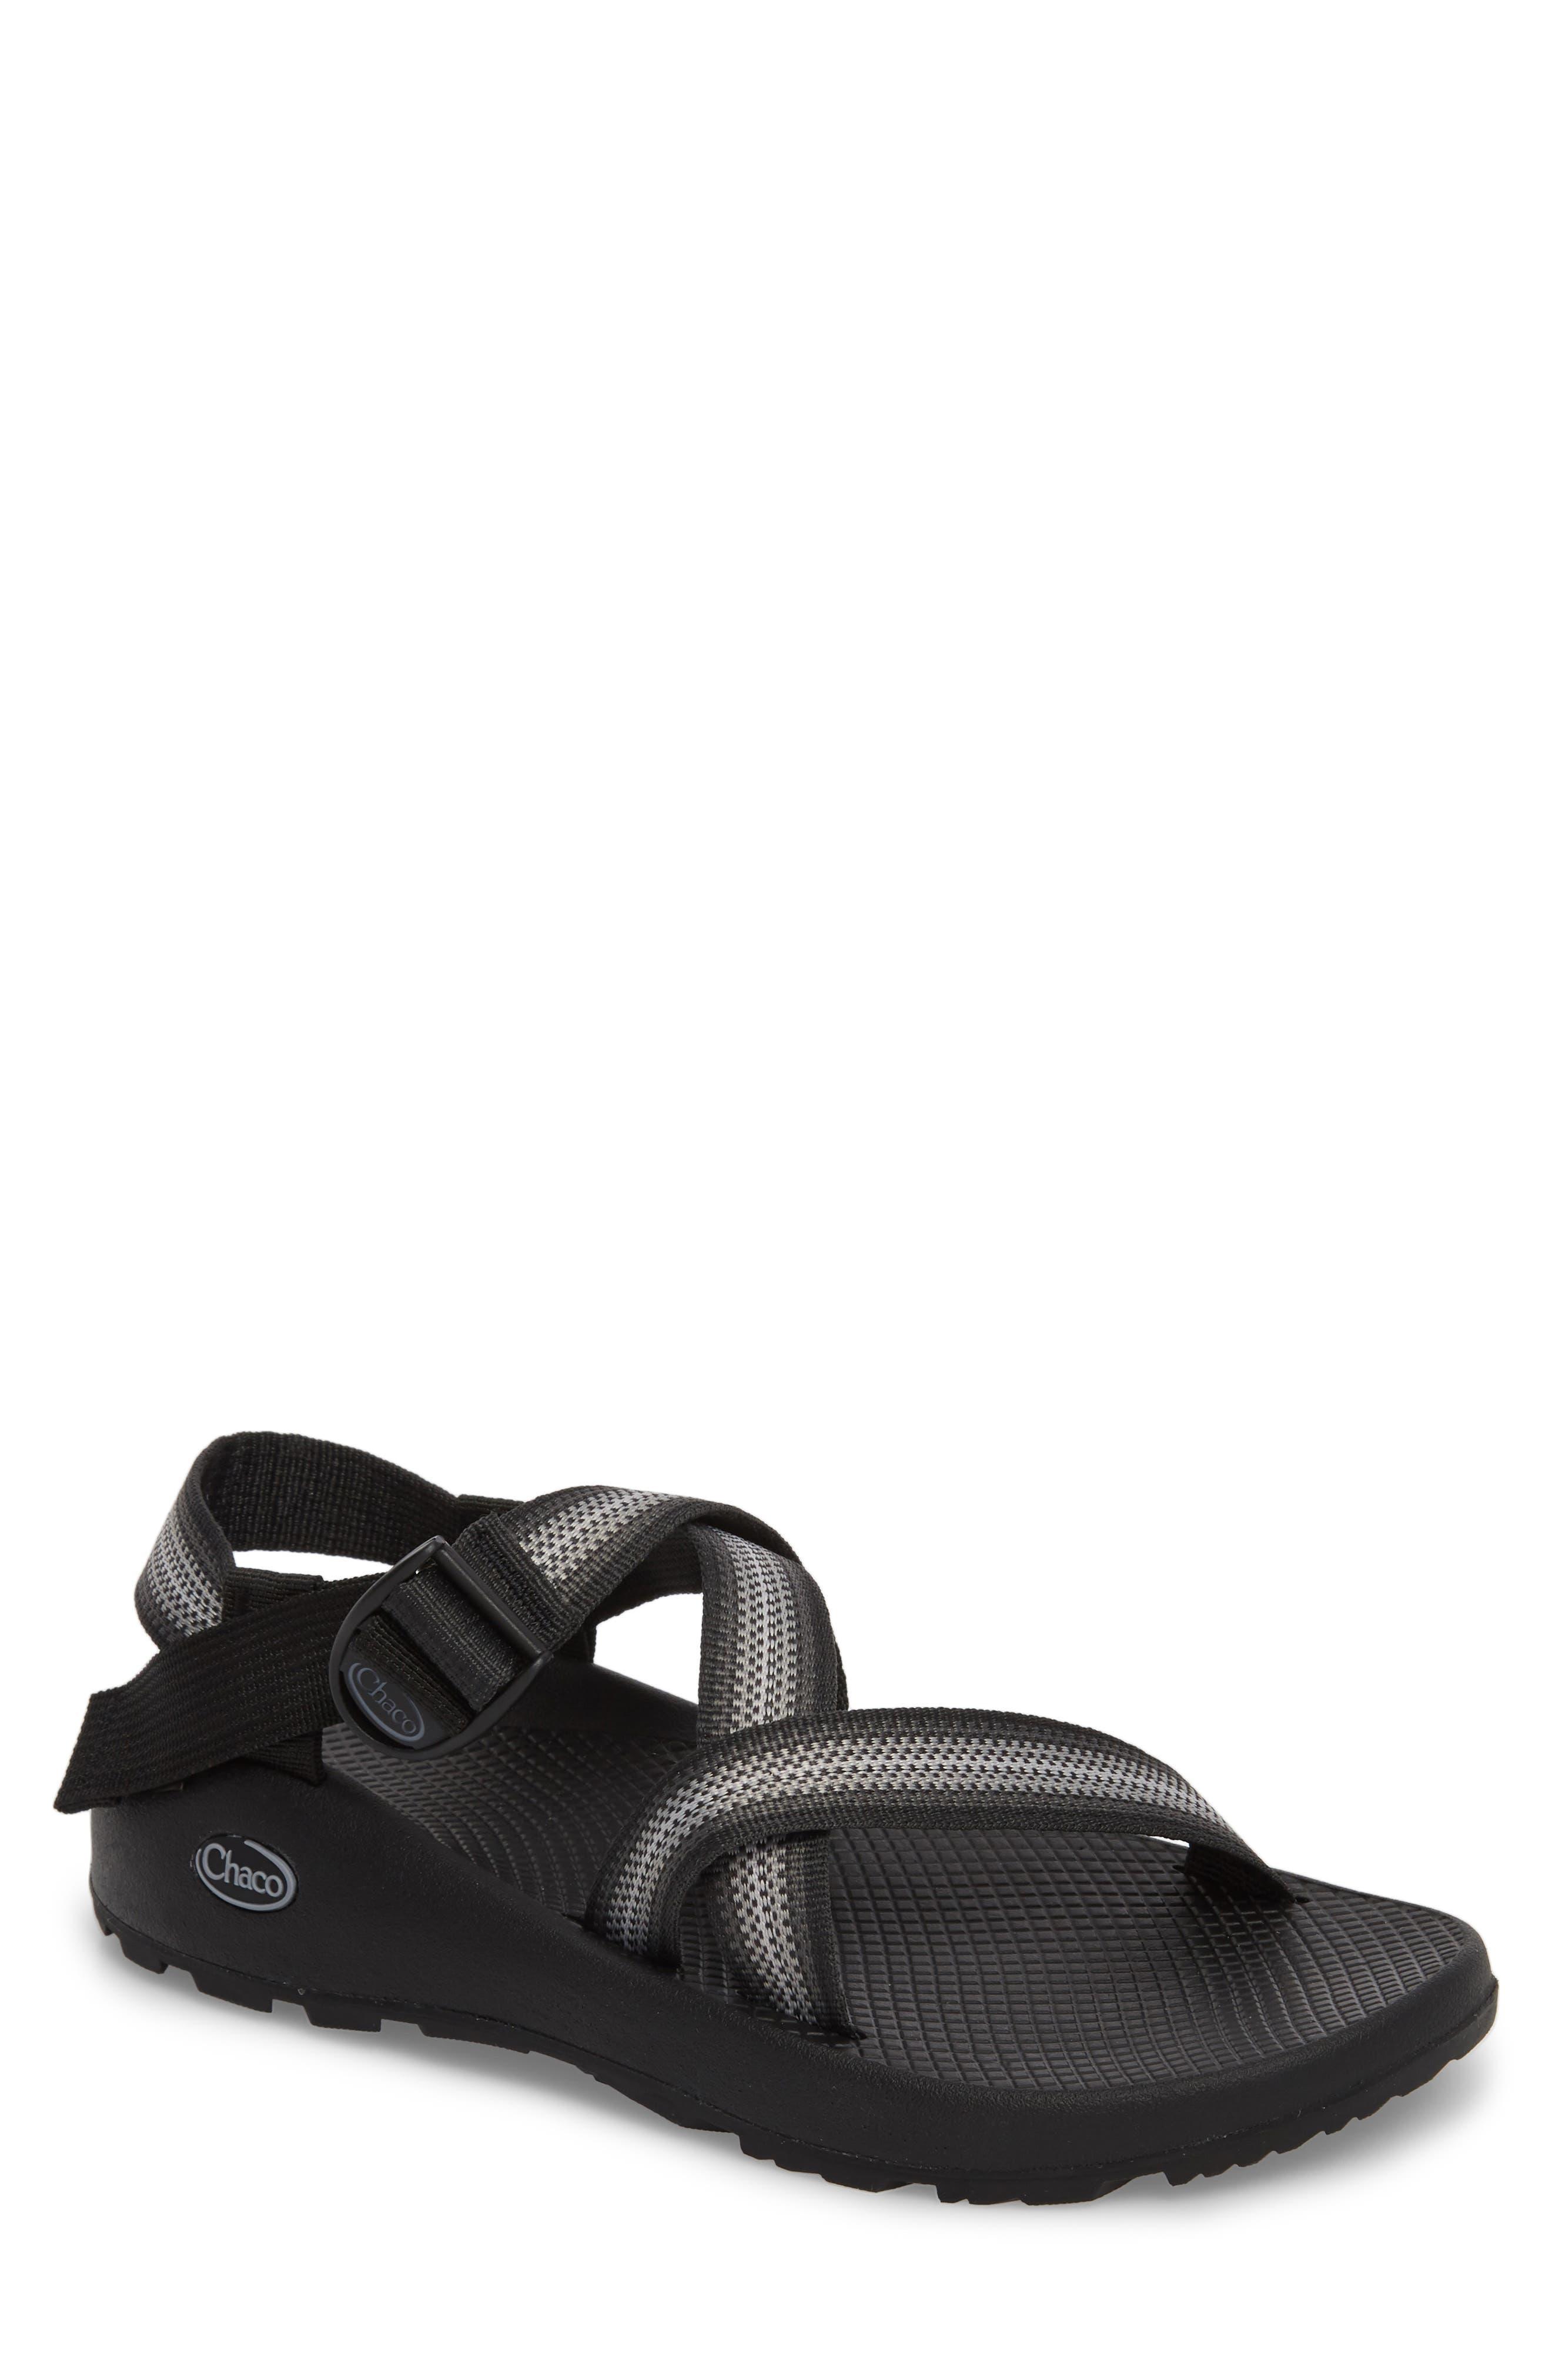 Z/1 Classic Sport Sandal,                             Main thumbnail 1, color,                             020